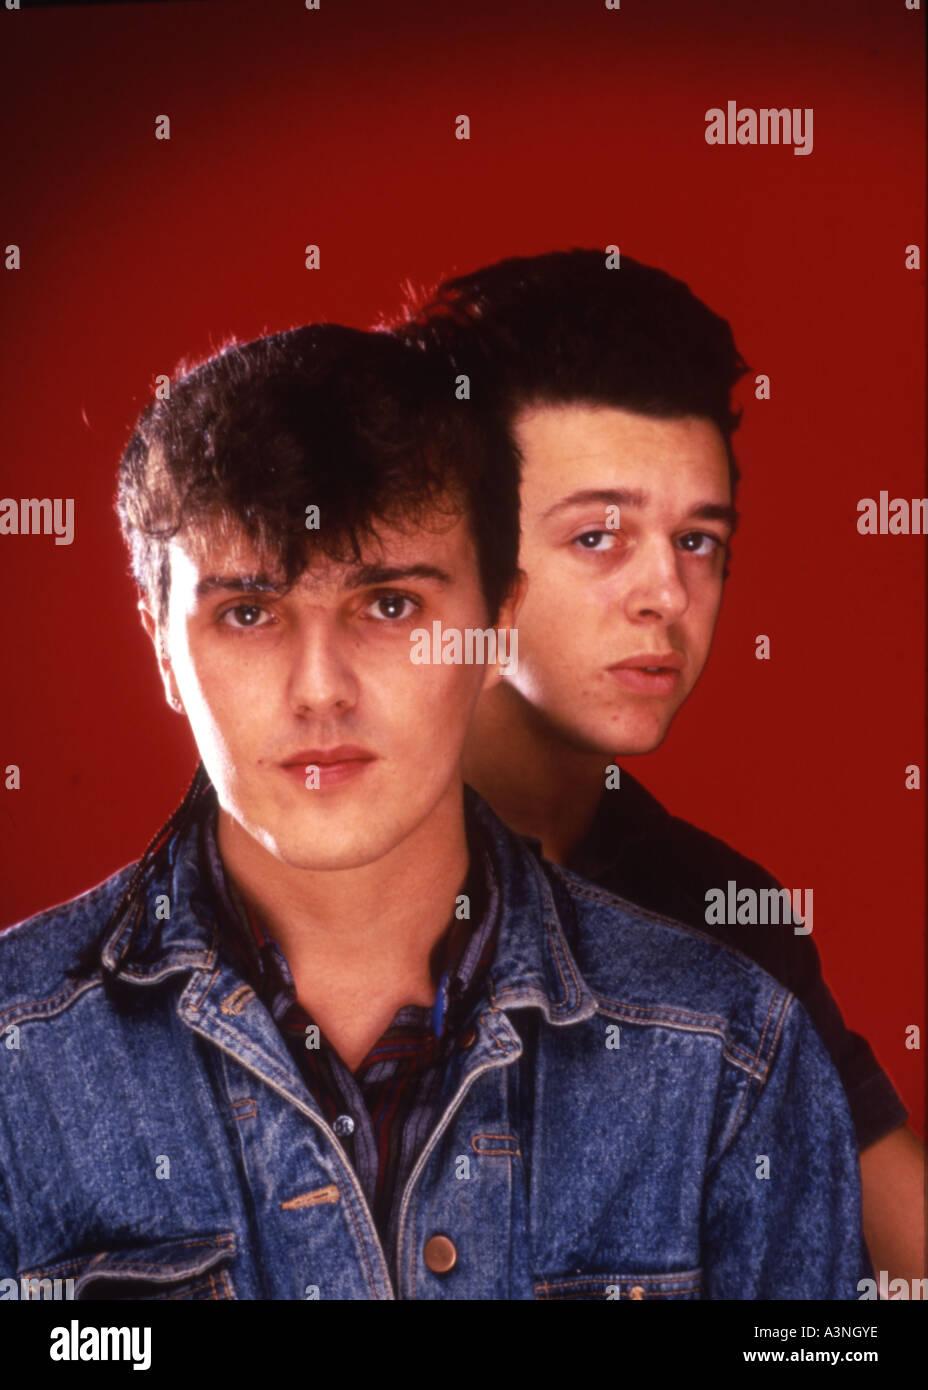 TEARS FOR FEARS UK 80s grupo con Curt Smith y Roland Orzabal en izquierda Imagen De Stock